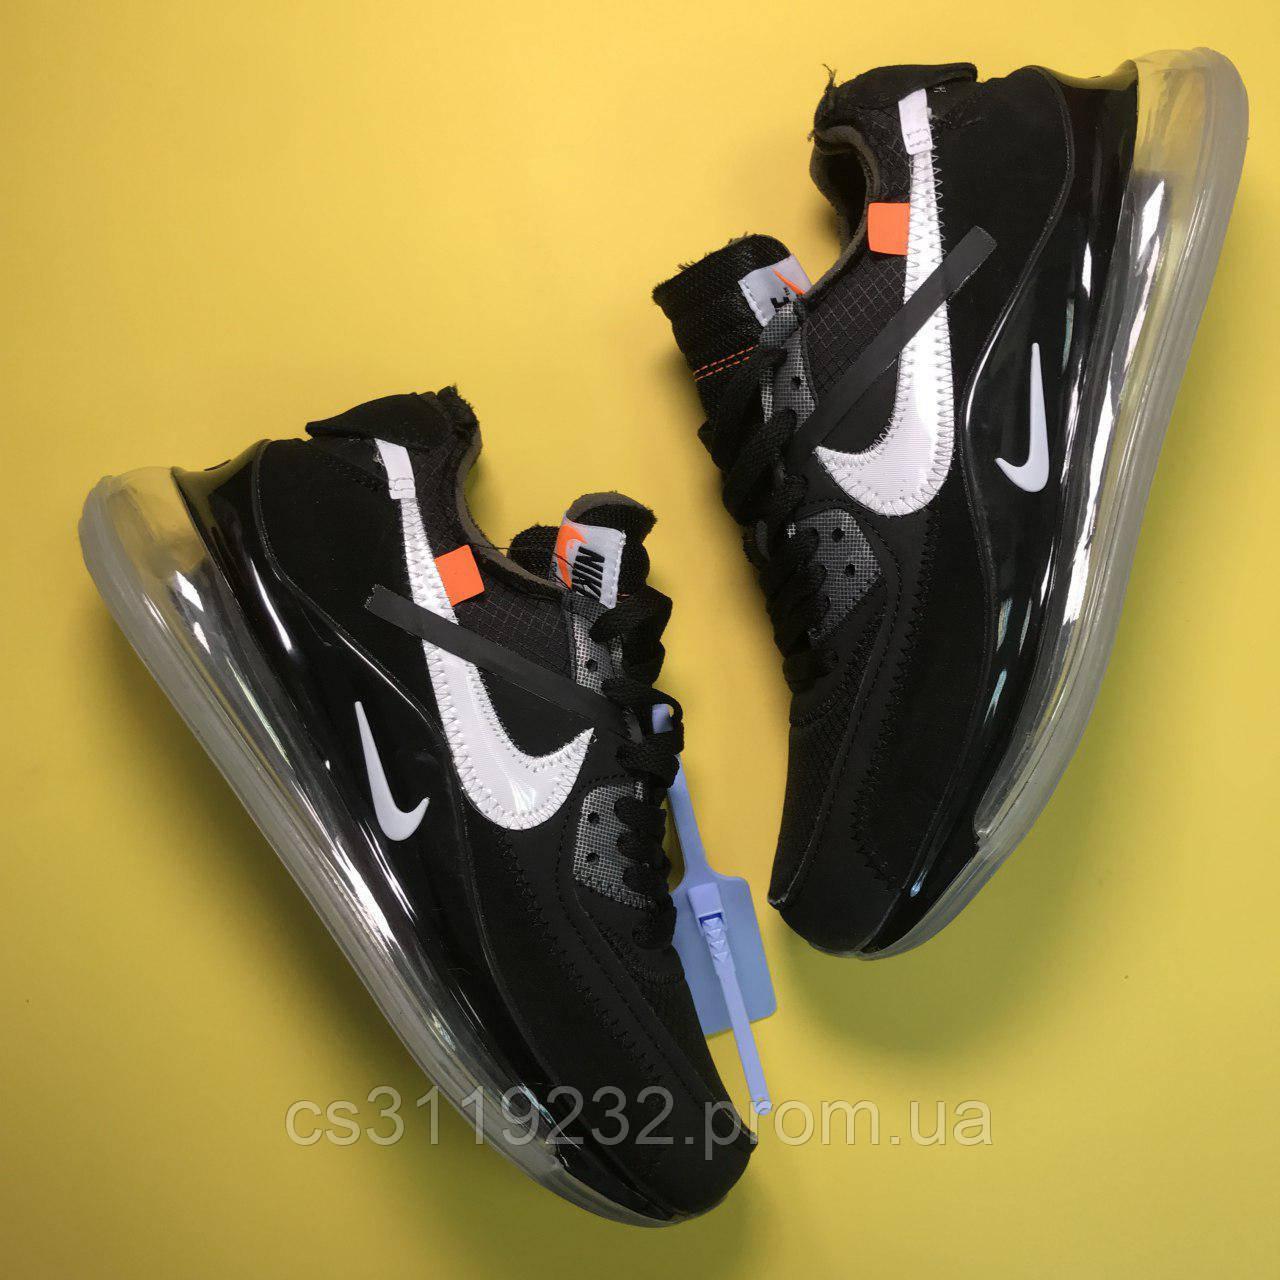 Мужские кроссовки Nike Air Max 720 OFF-White Black (черные)